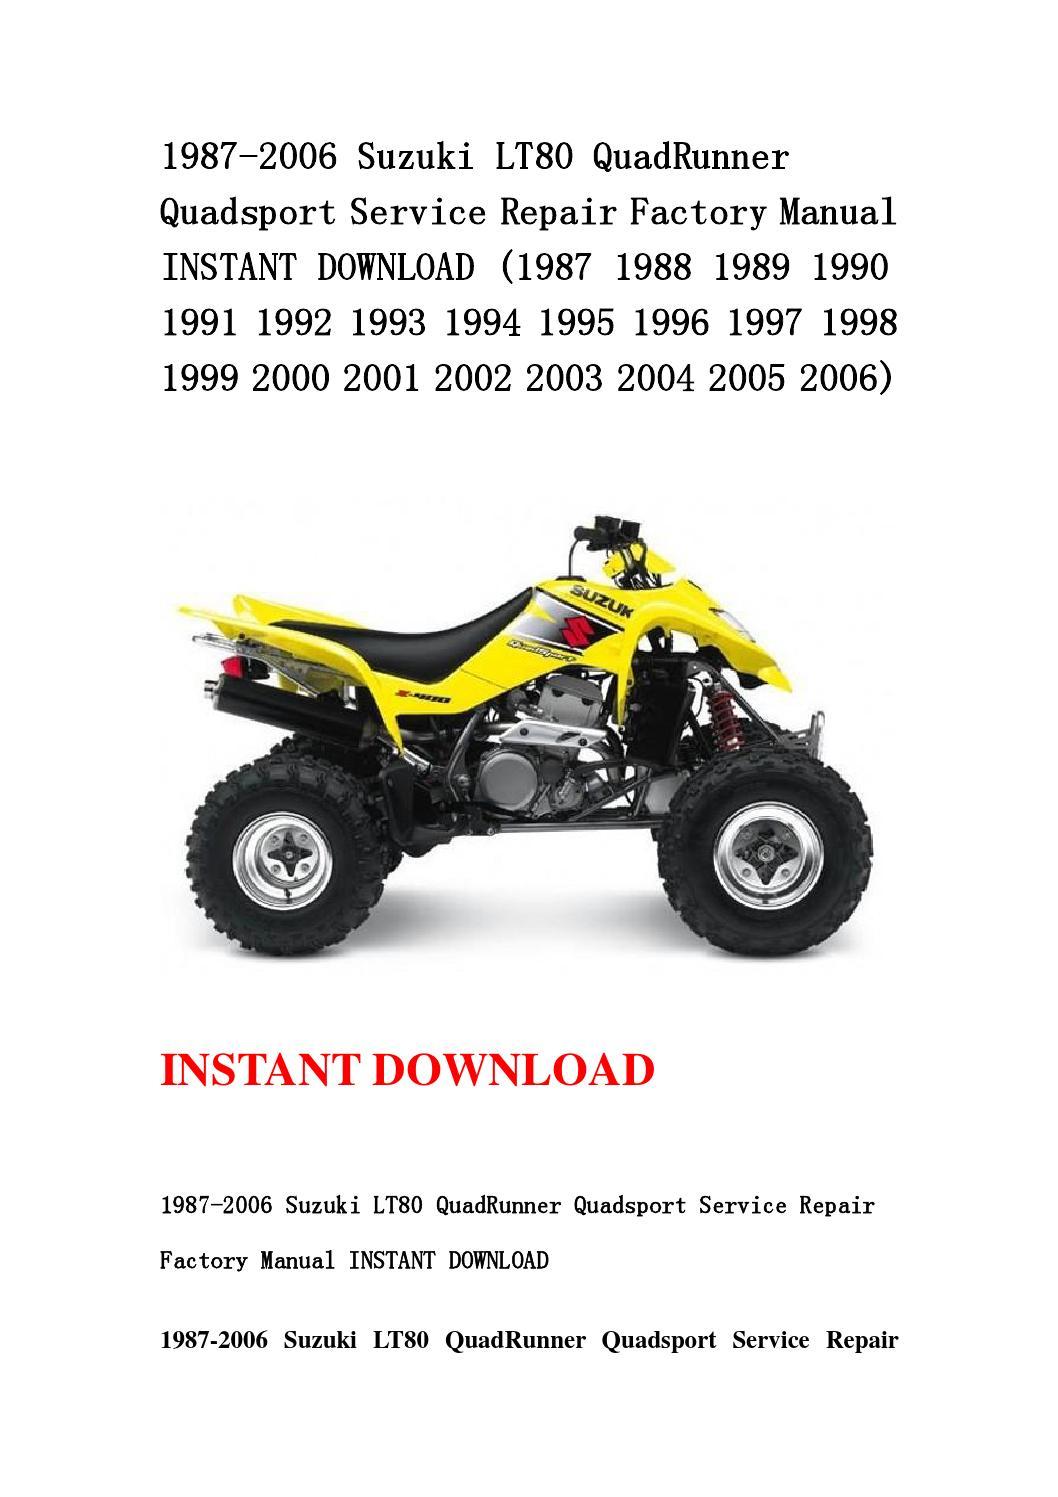 1987 2006 suzuki lt80 quadrunner quadsport service repair factory manual  instant download (1987 1988 by kmsjenfhn - issuu